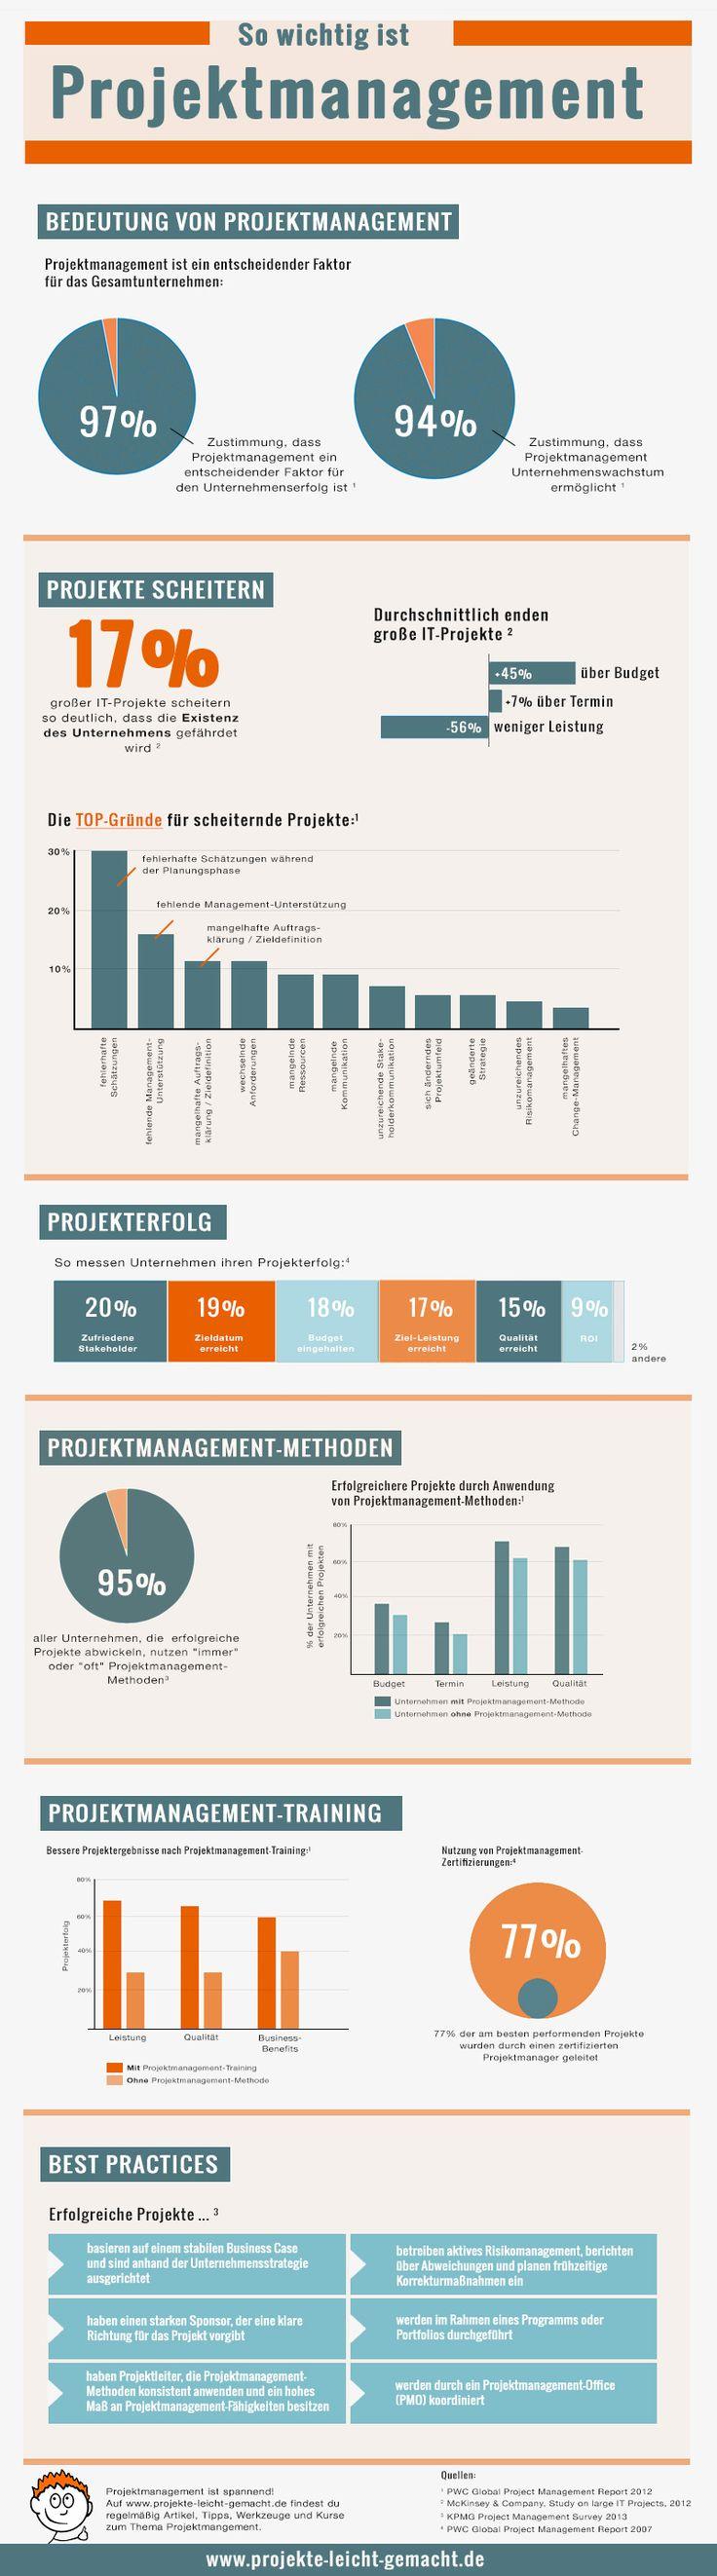 So wichtig ist Projektmanagement [Infografik] – Projekte leicht gemacht – Hajo Koopmann